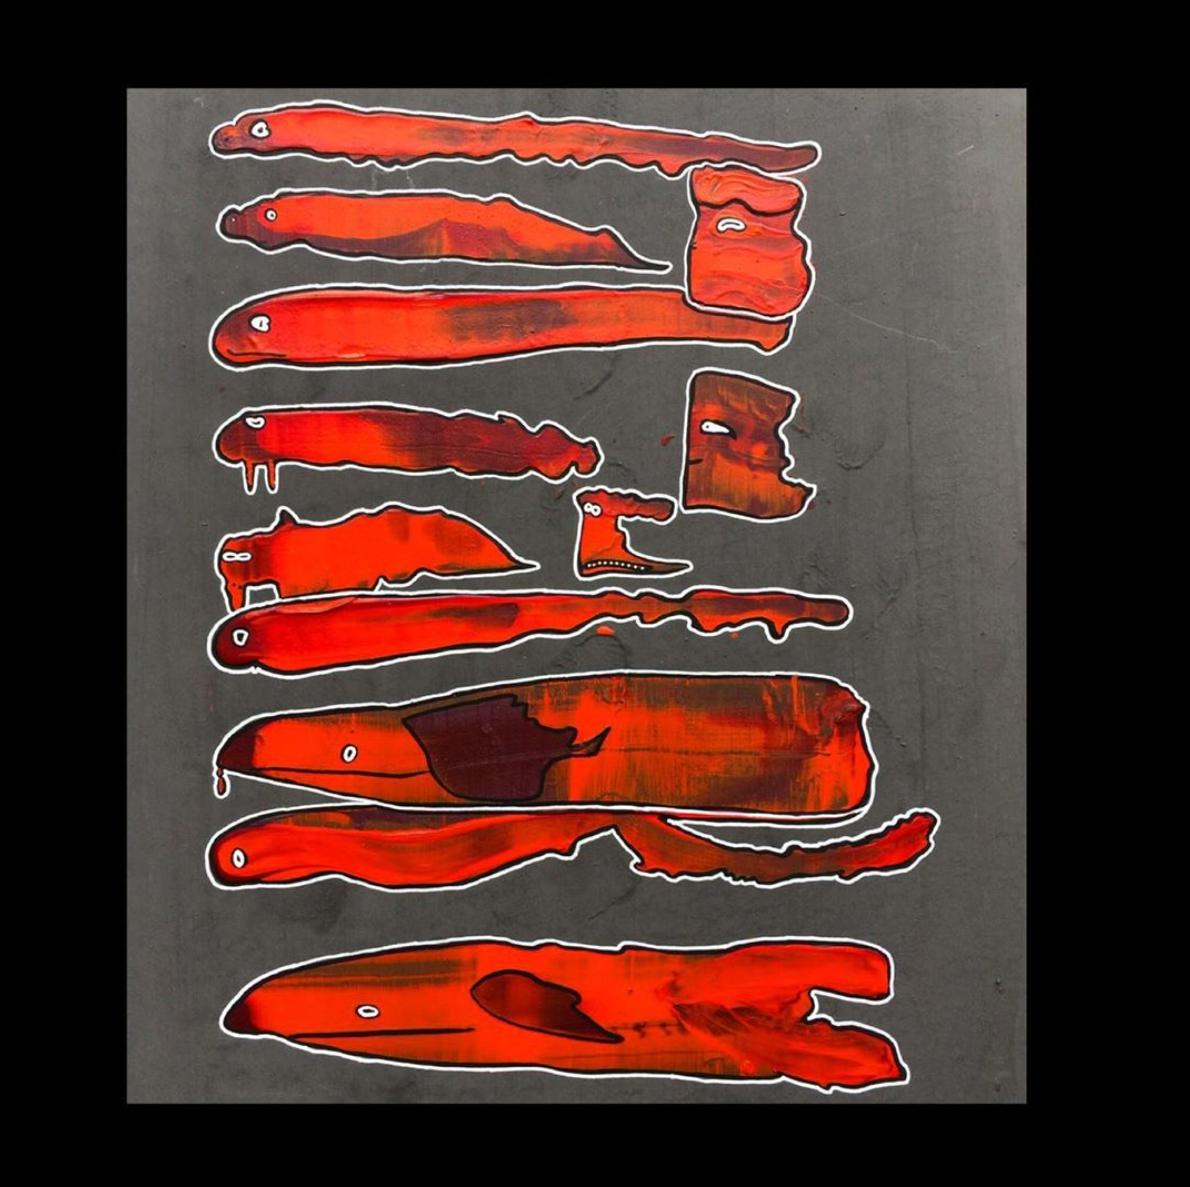 © 2020 by OVER THE END - all rights reserved #doodleart #doodleartist #deckart #snowboardart #snowboardartist #shred #sendit #snowboarding #skateboardart #skateboarding #skateboardartist #characterart #creatureart #mixedmedia #abstract #abstractart #funkyart #weird #weirdart #unusualart #art #surrealism #posca #doodle #neonart #unfineart #colourfulart #surrealism #psychedelicart #pareidoliaartist #pareidolia